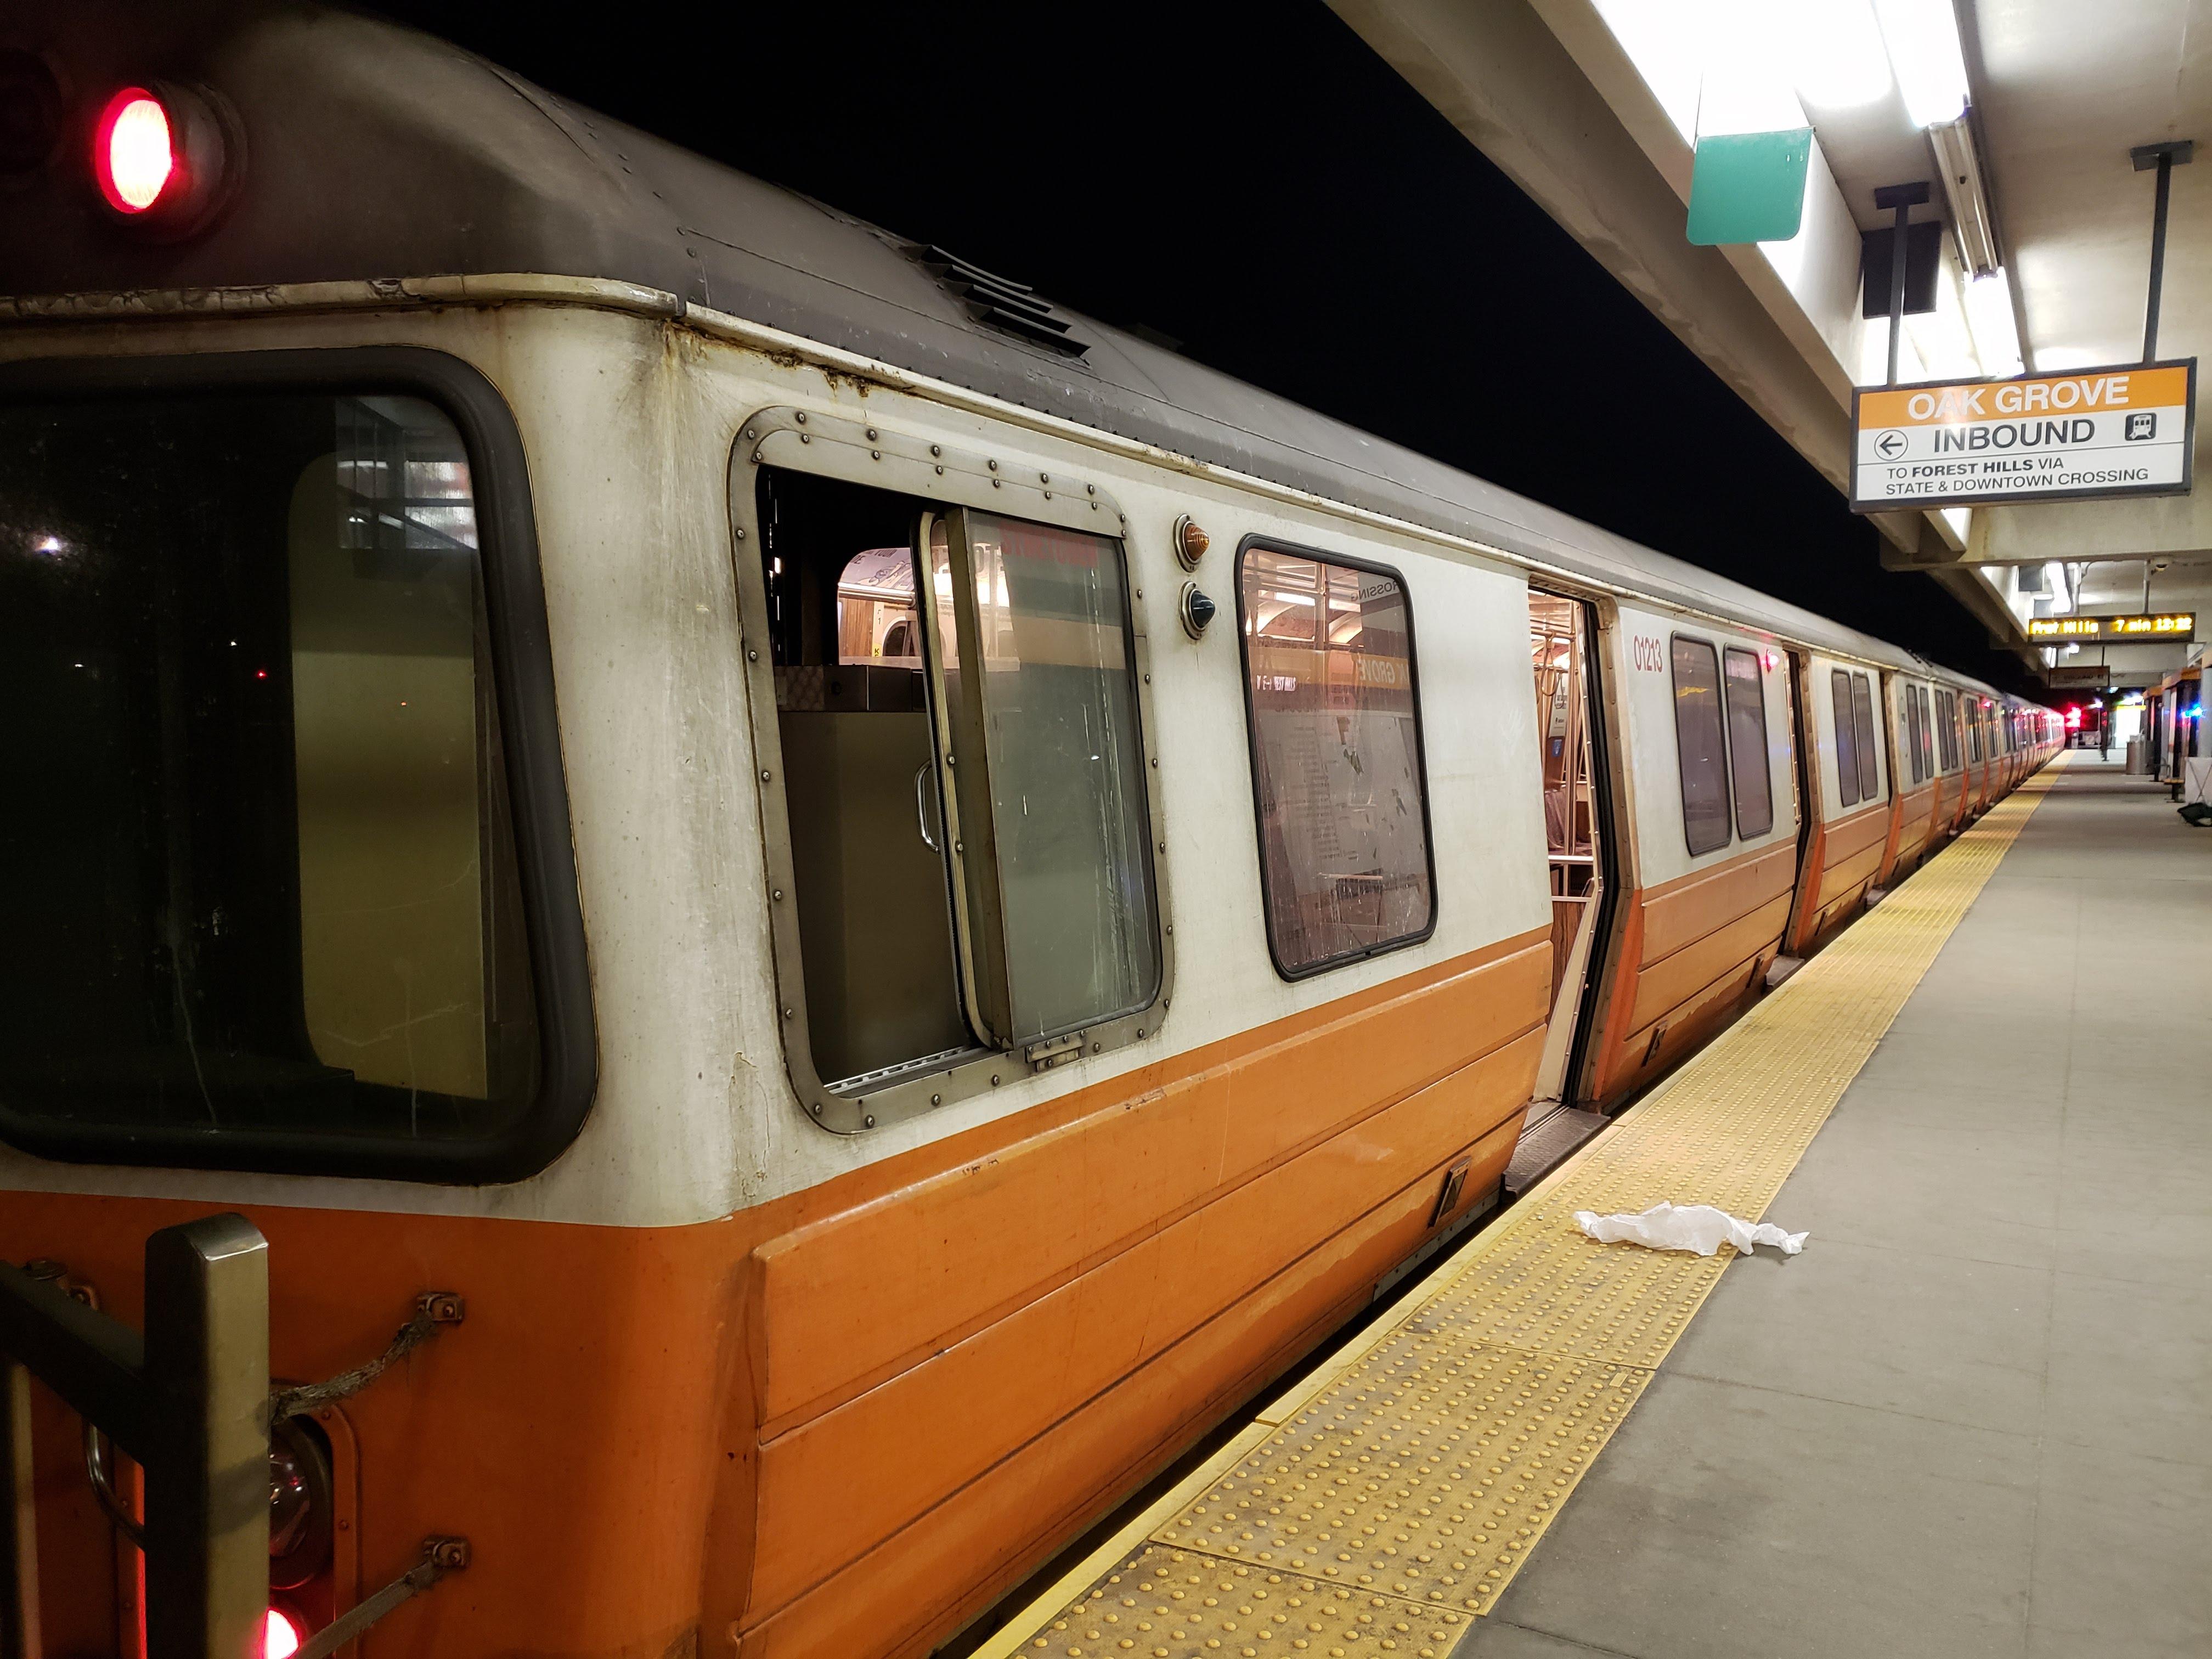 Filembta orange line car in 2018 04g wikimedia commons filembta orange line car in 2018 04g sciox Gallery